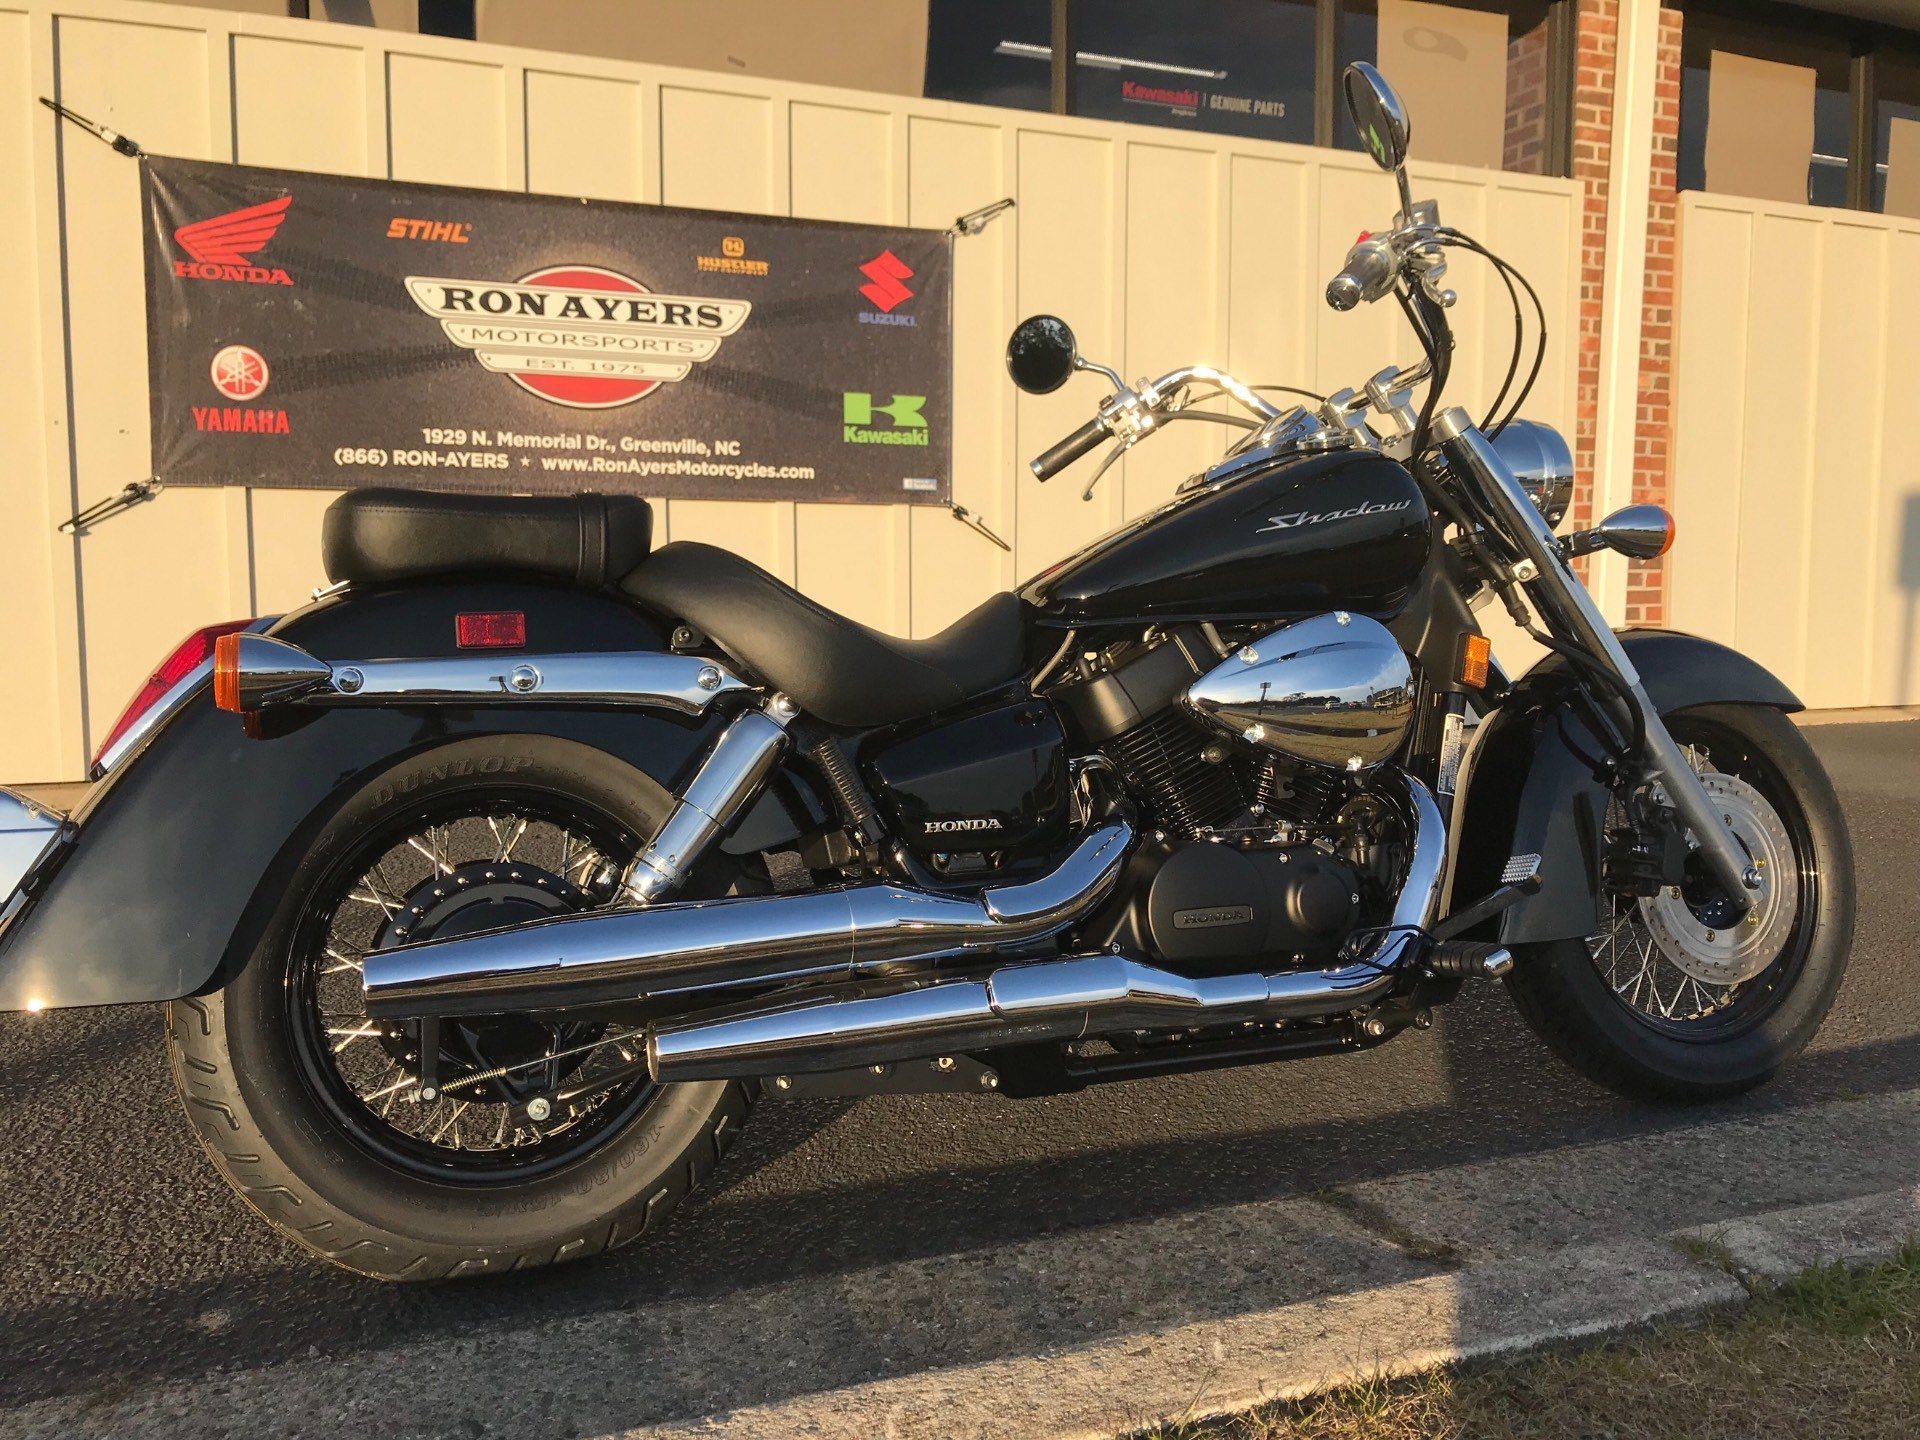 New 2019 Honda Shadow Aero 750 Motorcycles In Greenville Nc Stock